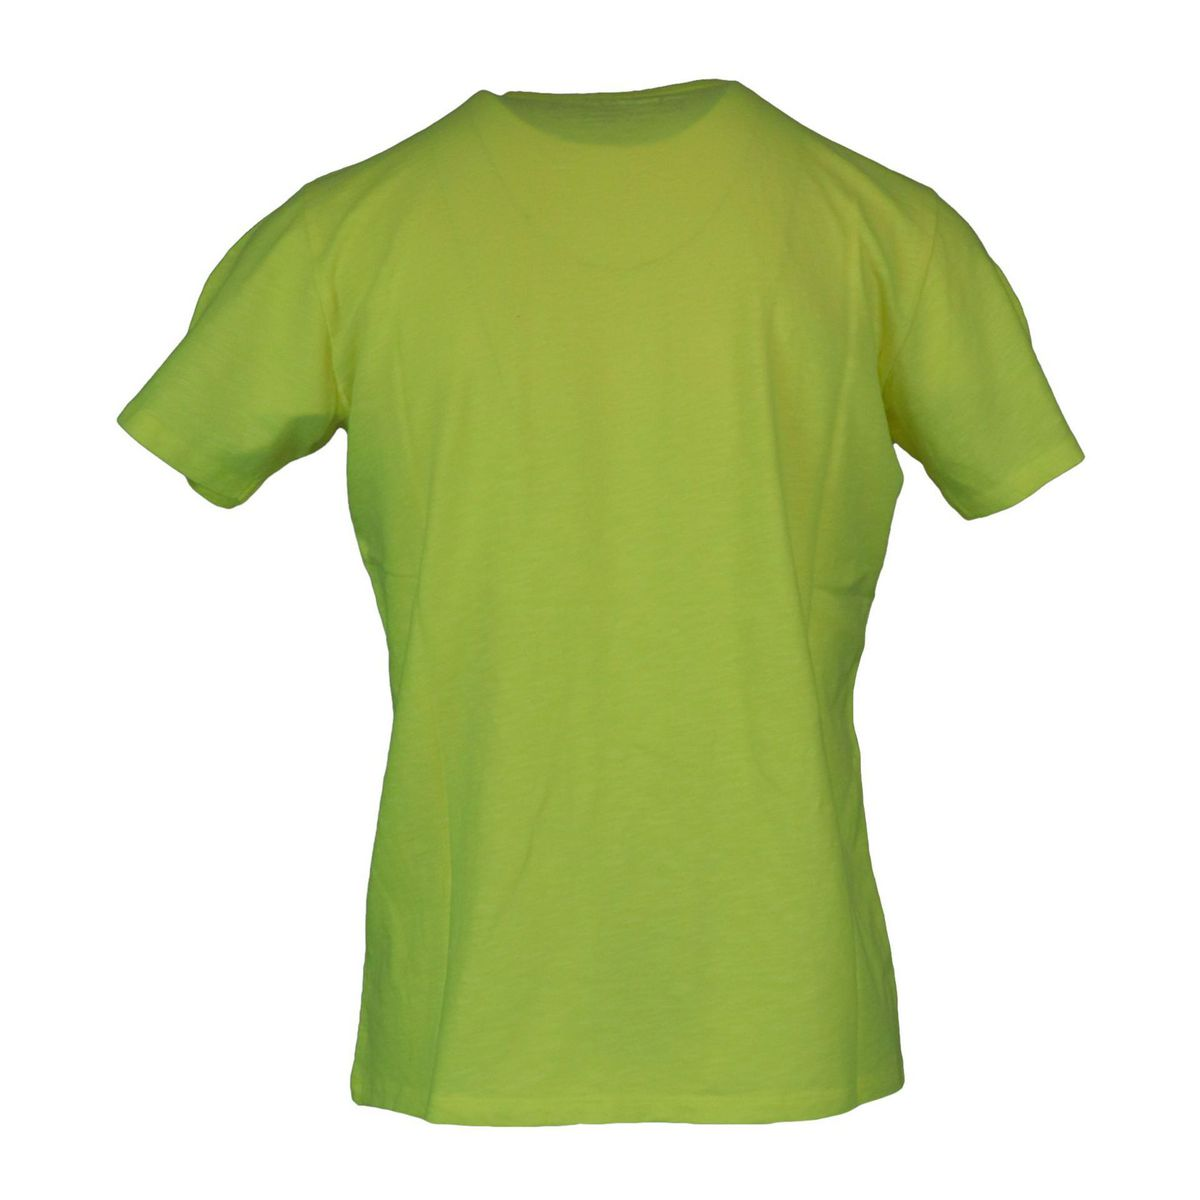 President T-shirt with pocket Giallo MC2 Saint Barth